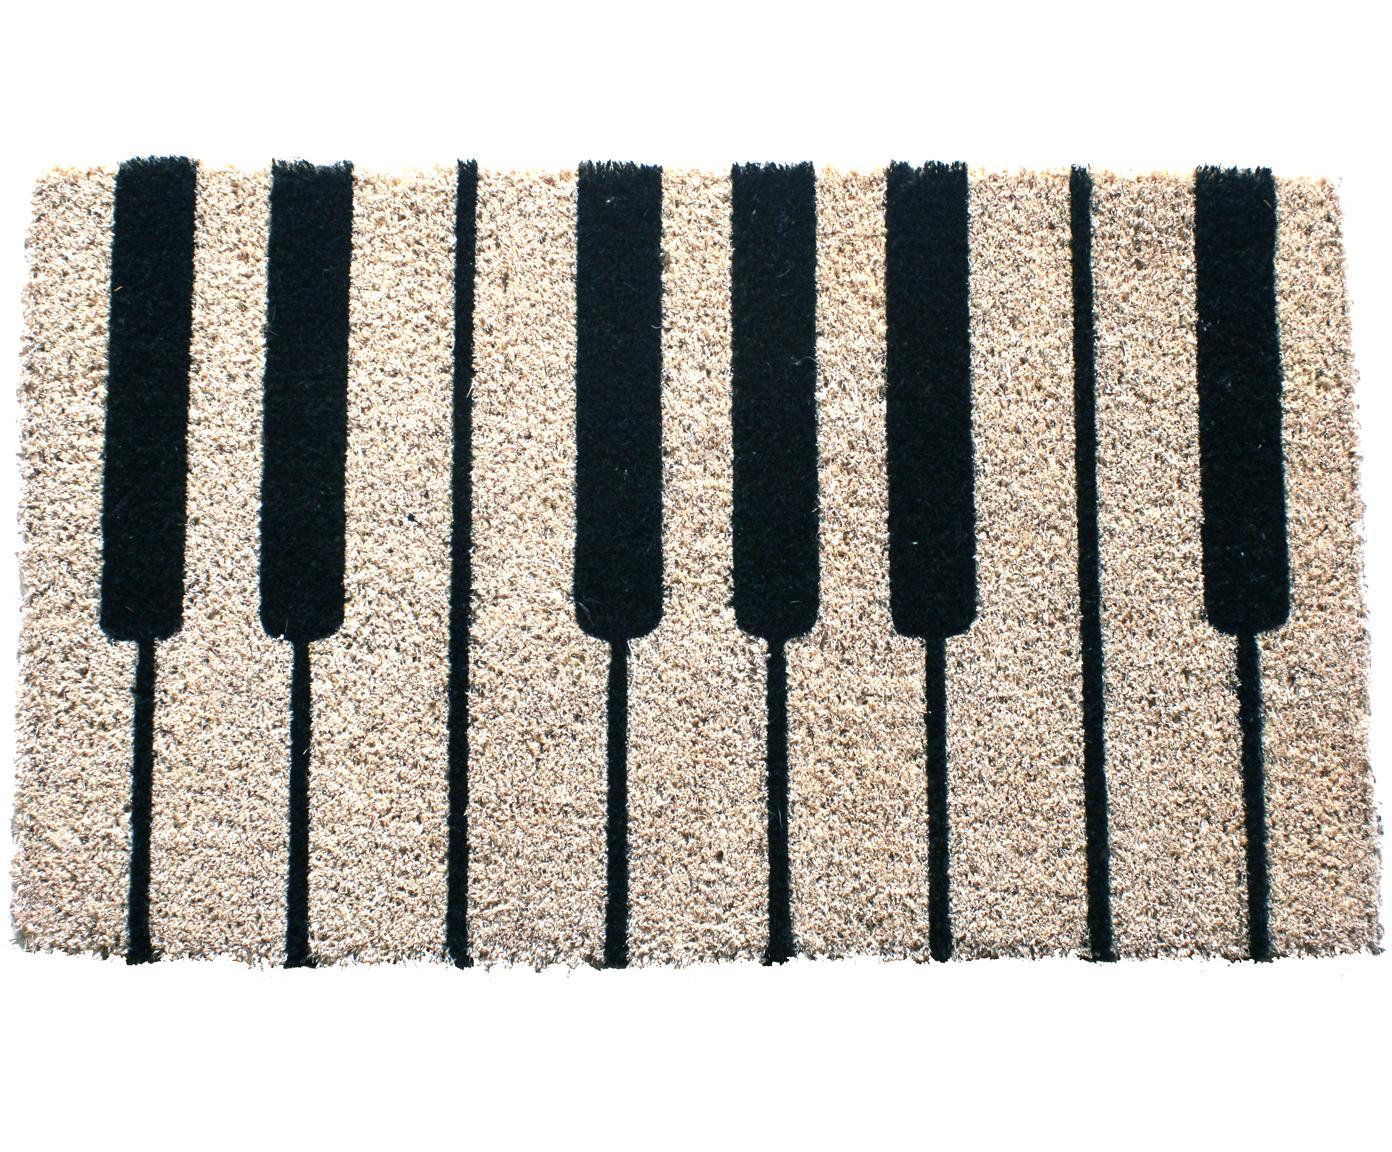 Felpudo Piano, Parte superior: fibras de coco, Reverso: plástico (PVC), Negro, crema, An 40 x L 60 cm